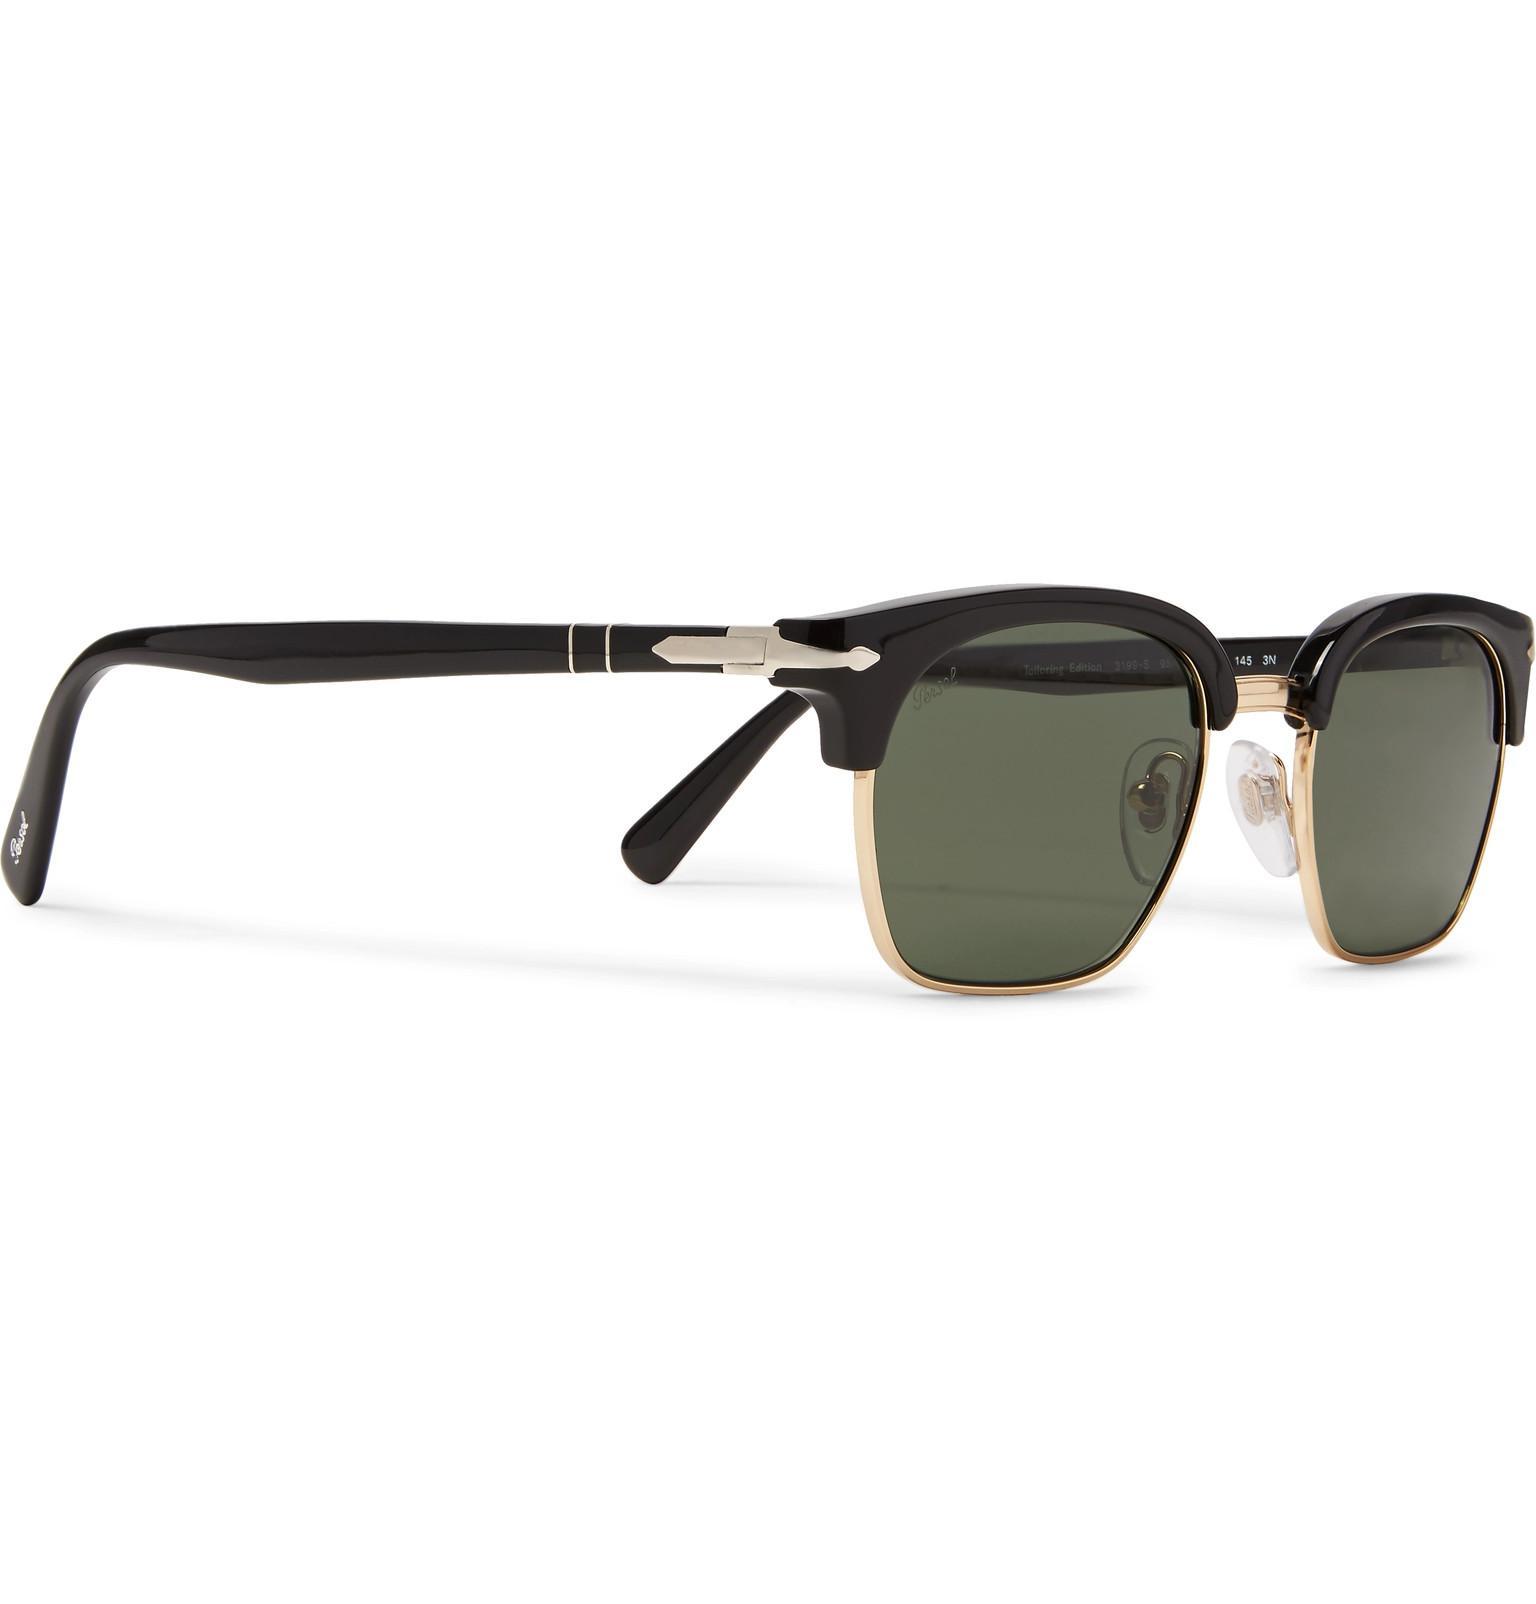 19e2fd05b1419 Persol - Black D-frame Acetate And Gold-tone Sunglasses for Men - Lyst.  View fullscreen